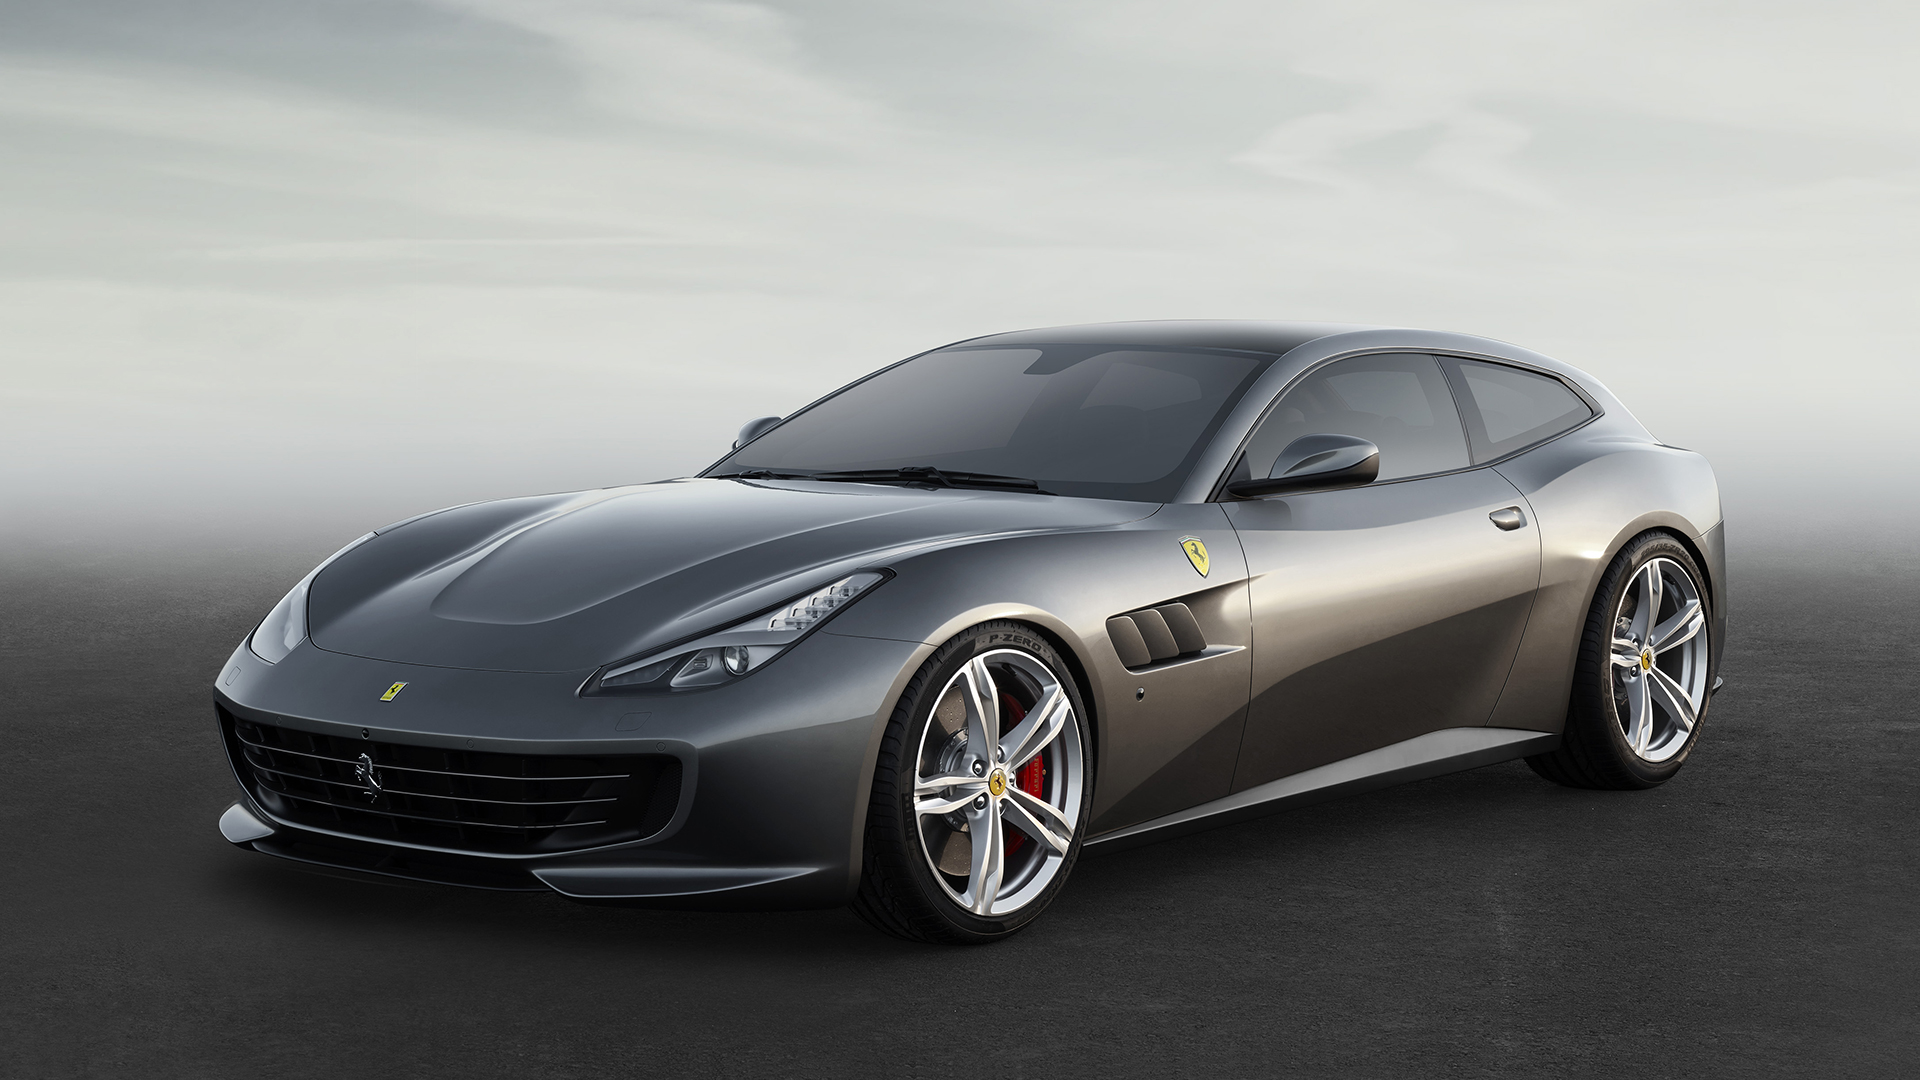 Ferrariklubben